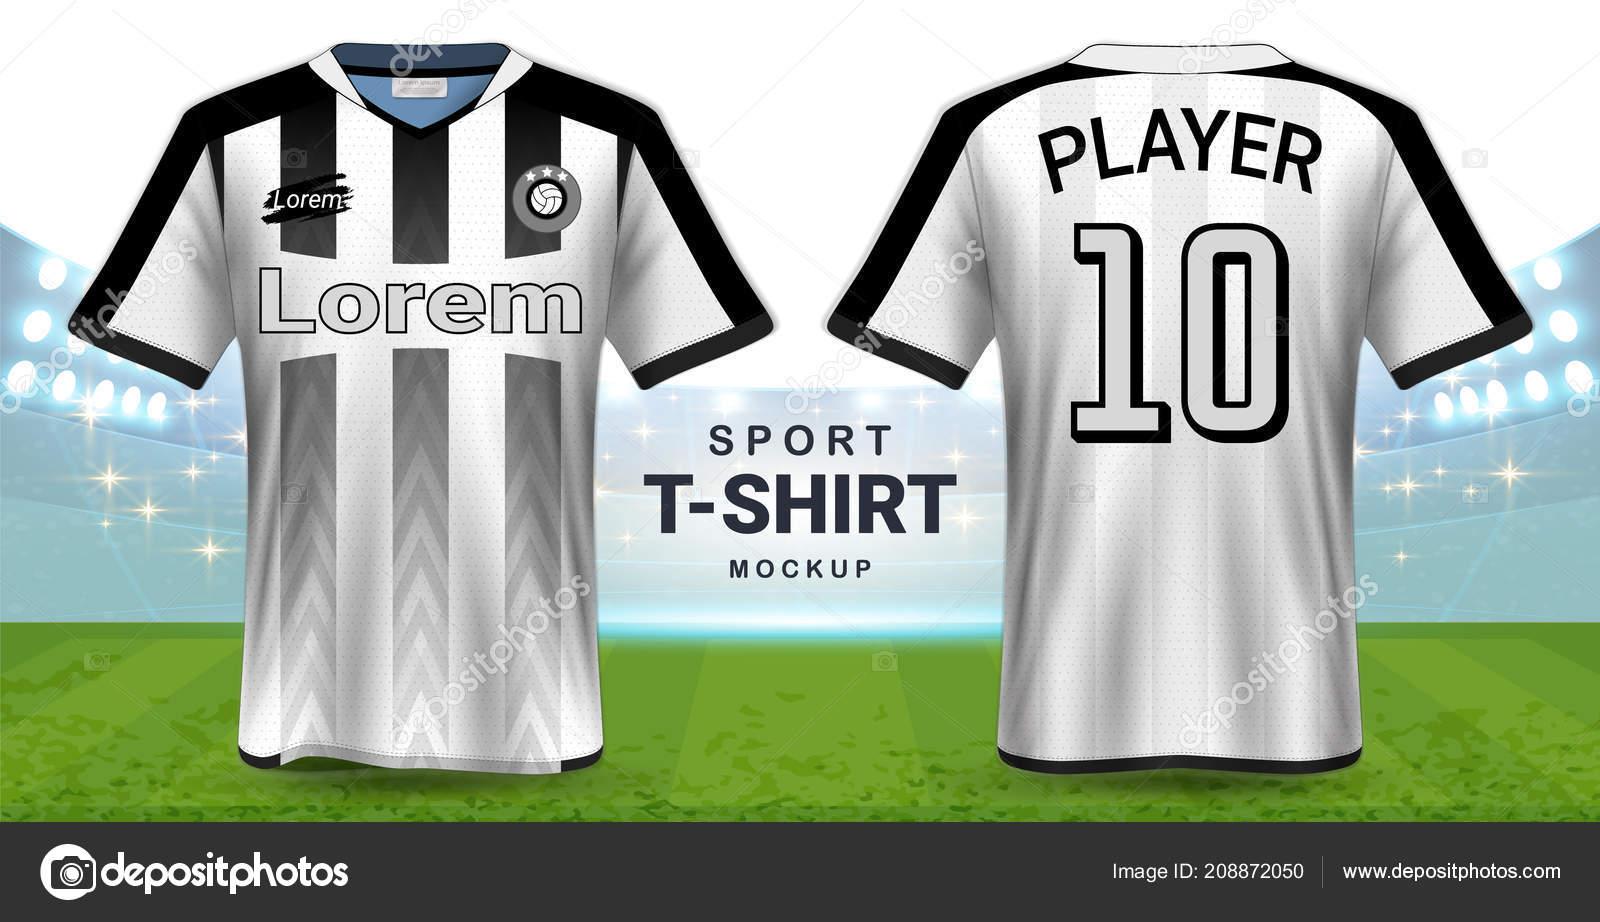 52a5759510 Camisa Futebol Modelo Maquete Shirt Sportswear Design Gráfico ...